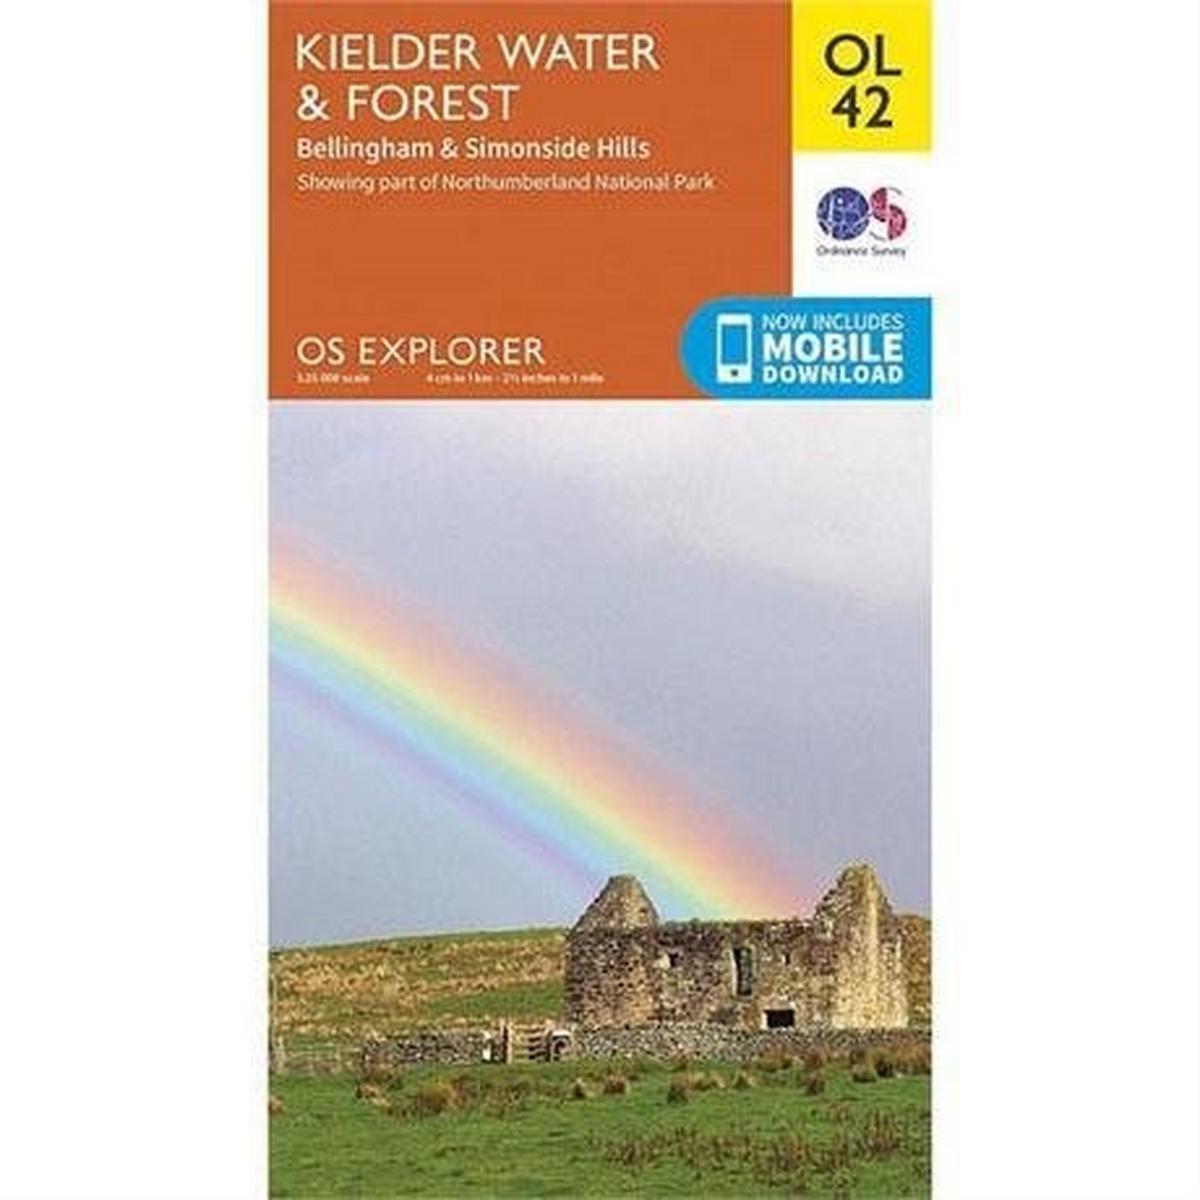 Ordnance Survey OS Explorer Map OL42 Kielder Water & Forest